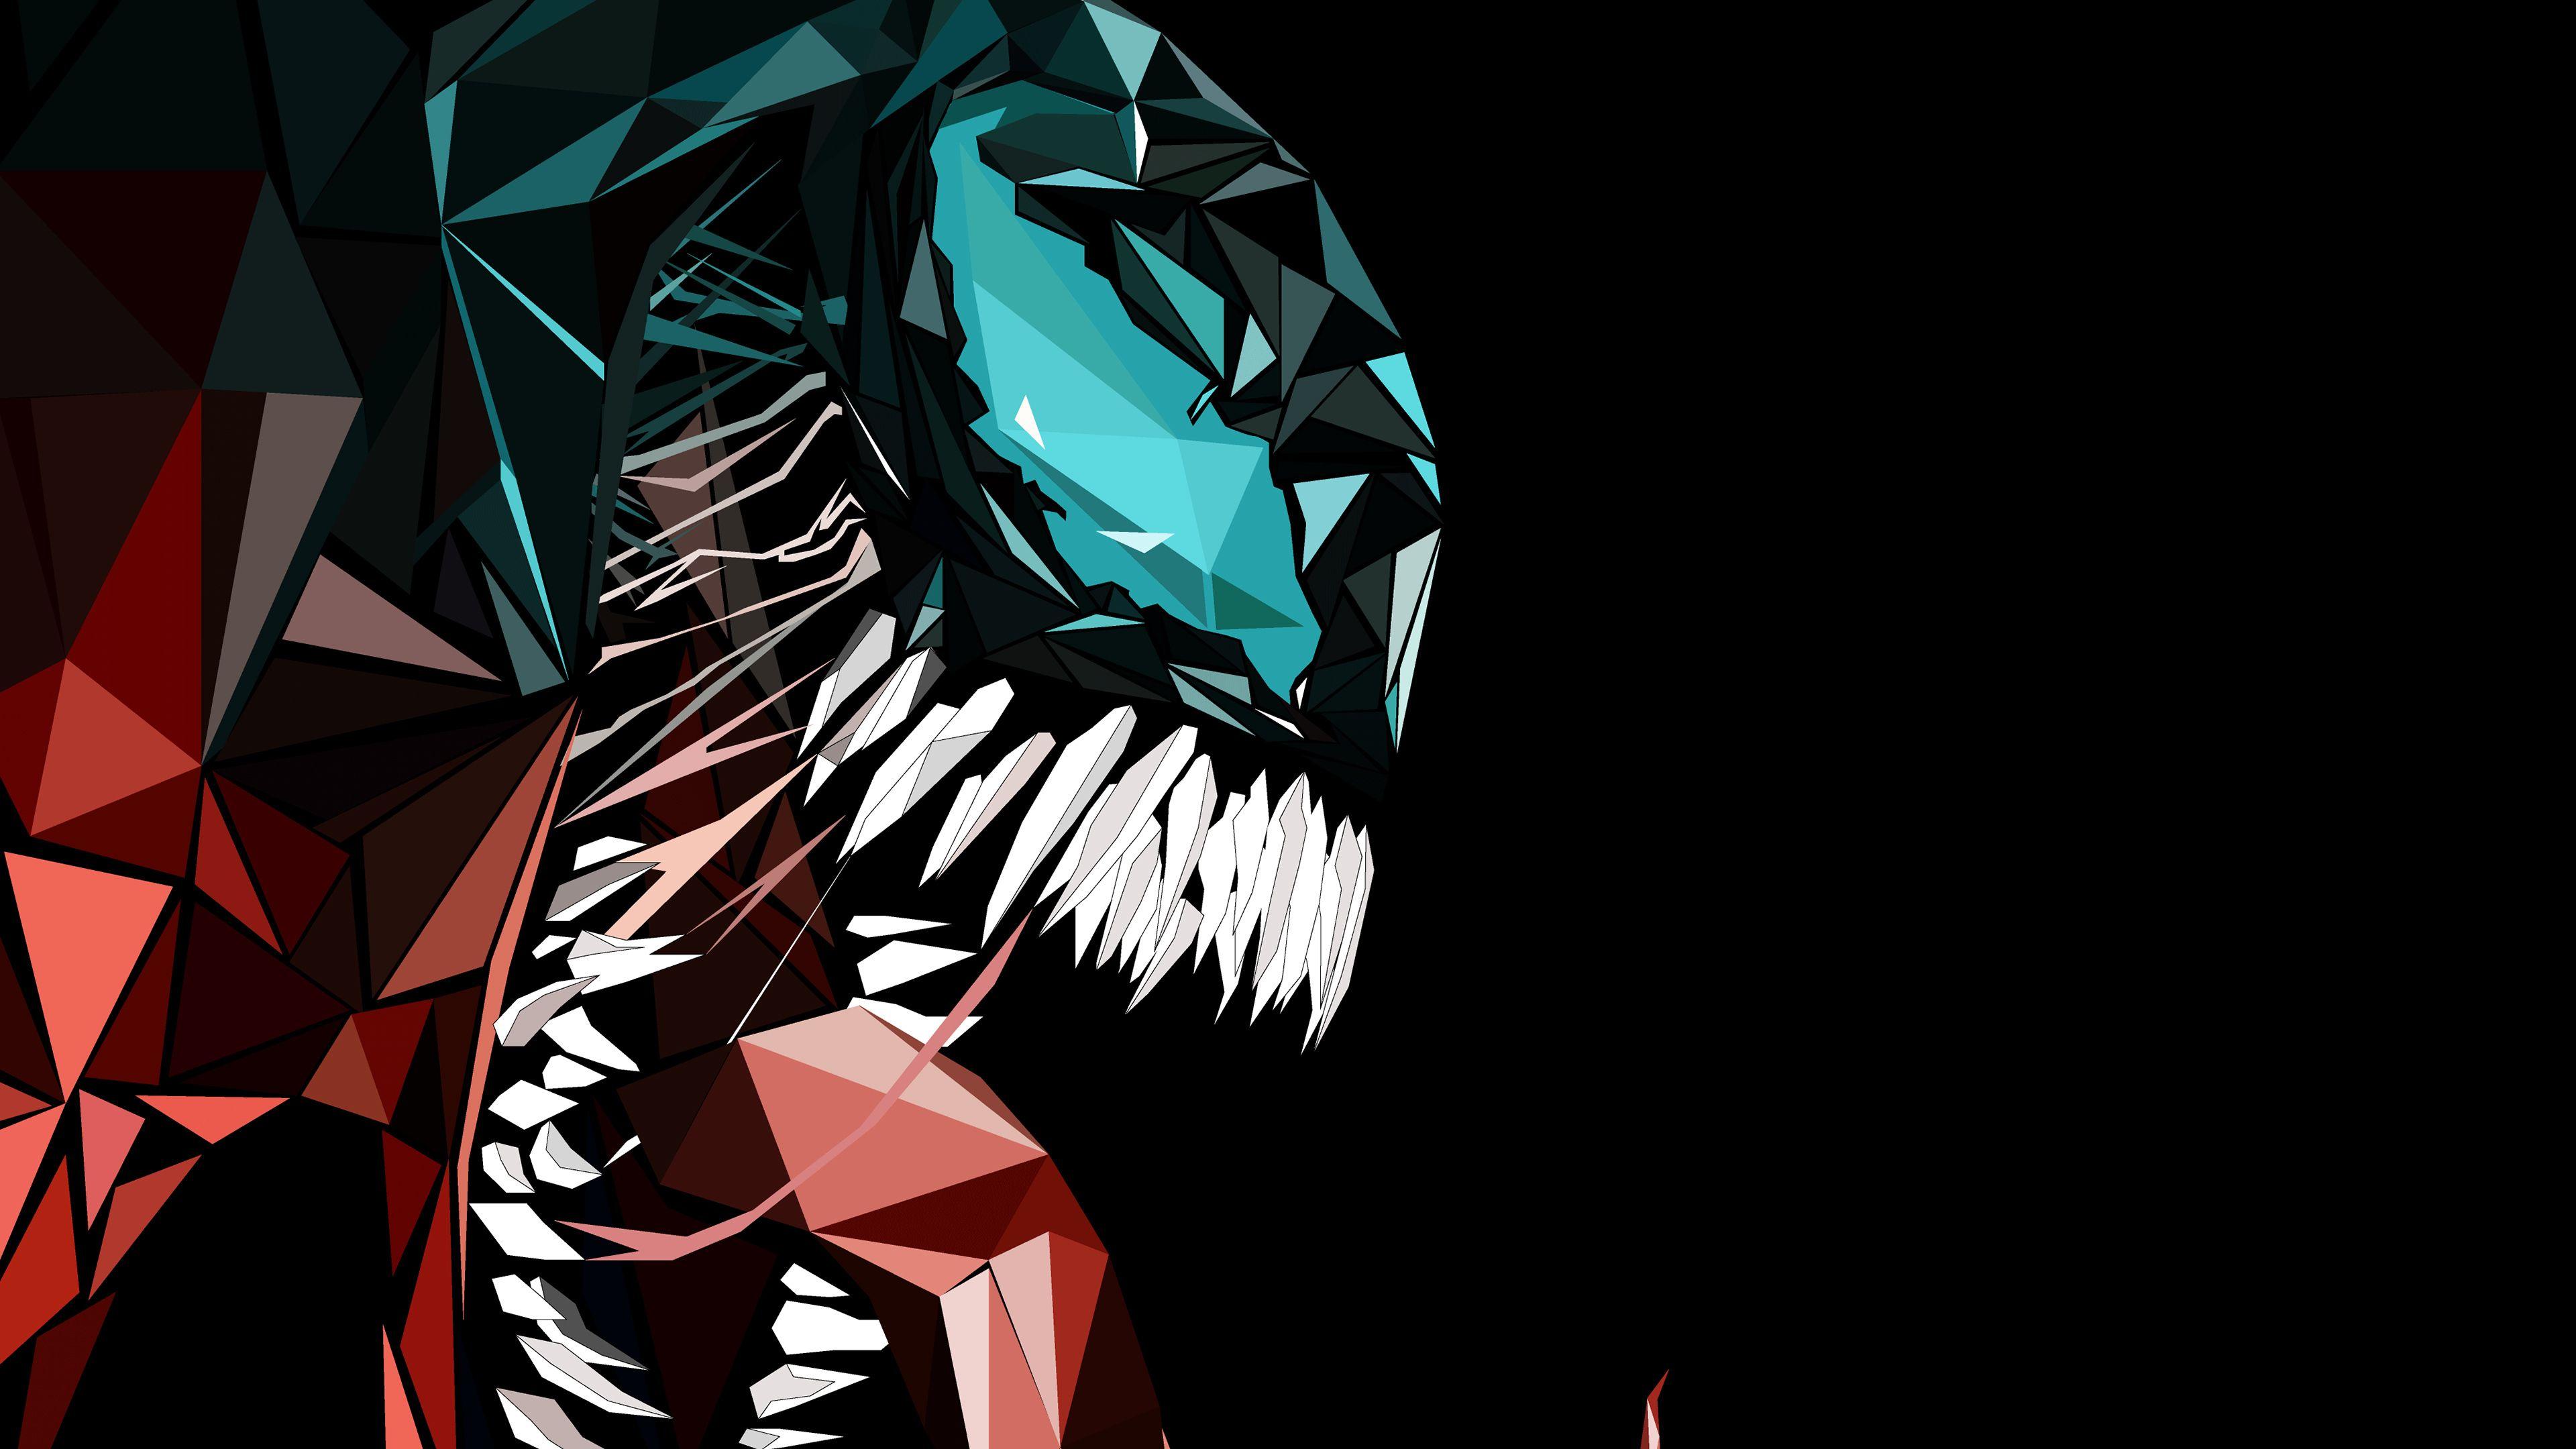 Wallpaper 4k Venom Abstract 4k 4kwallpapers, artwork